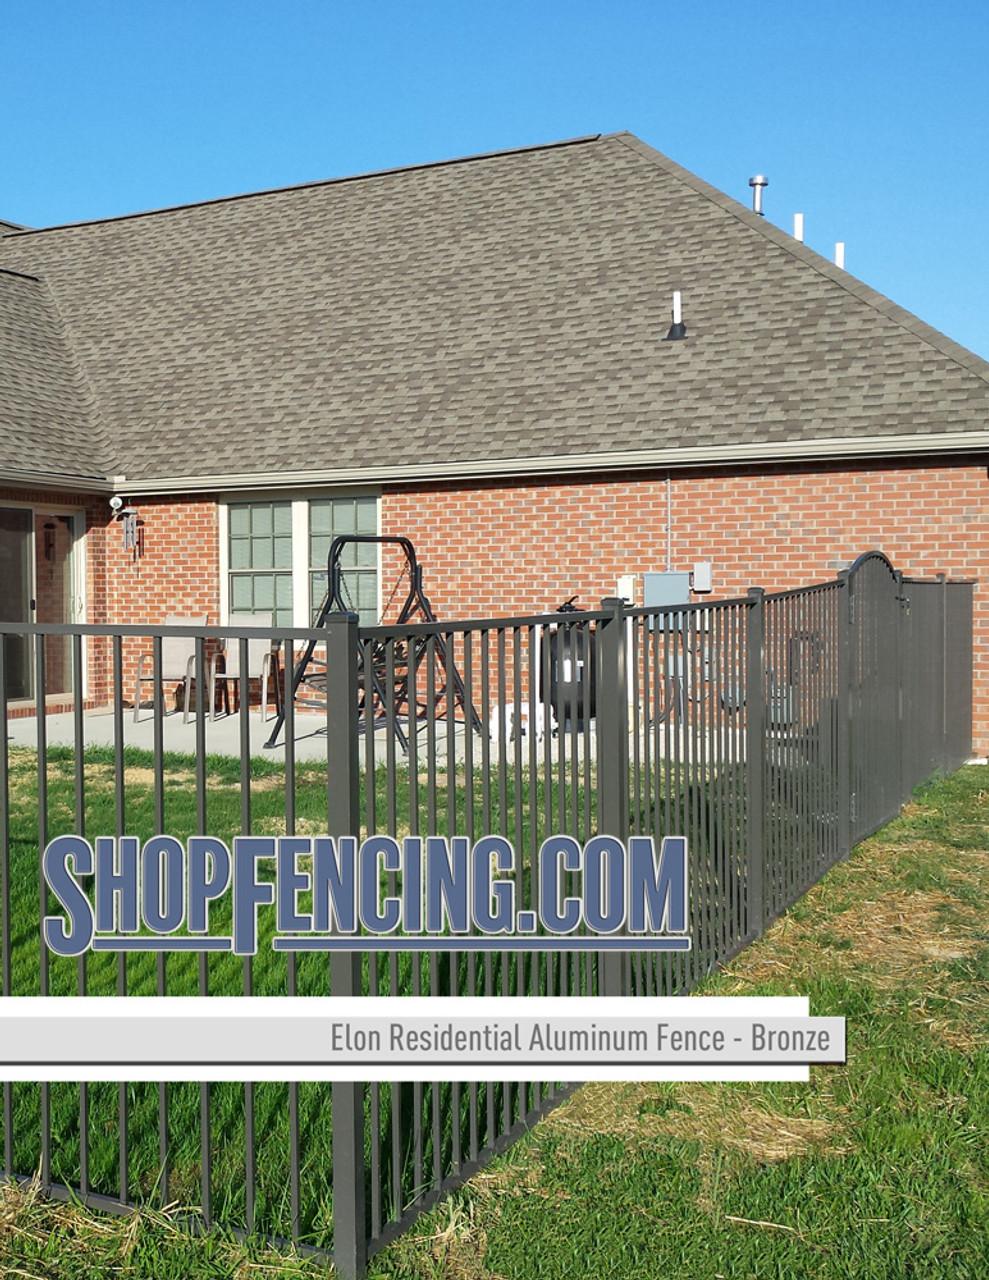 Bronze Residential Elon Aluminum Fencing From ShopFencing.com